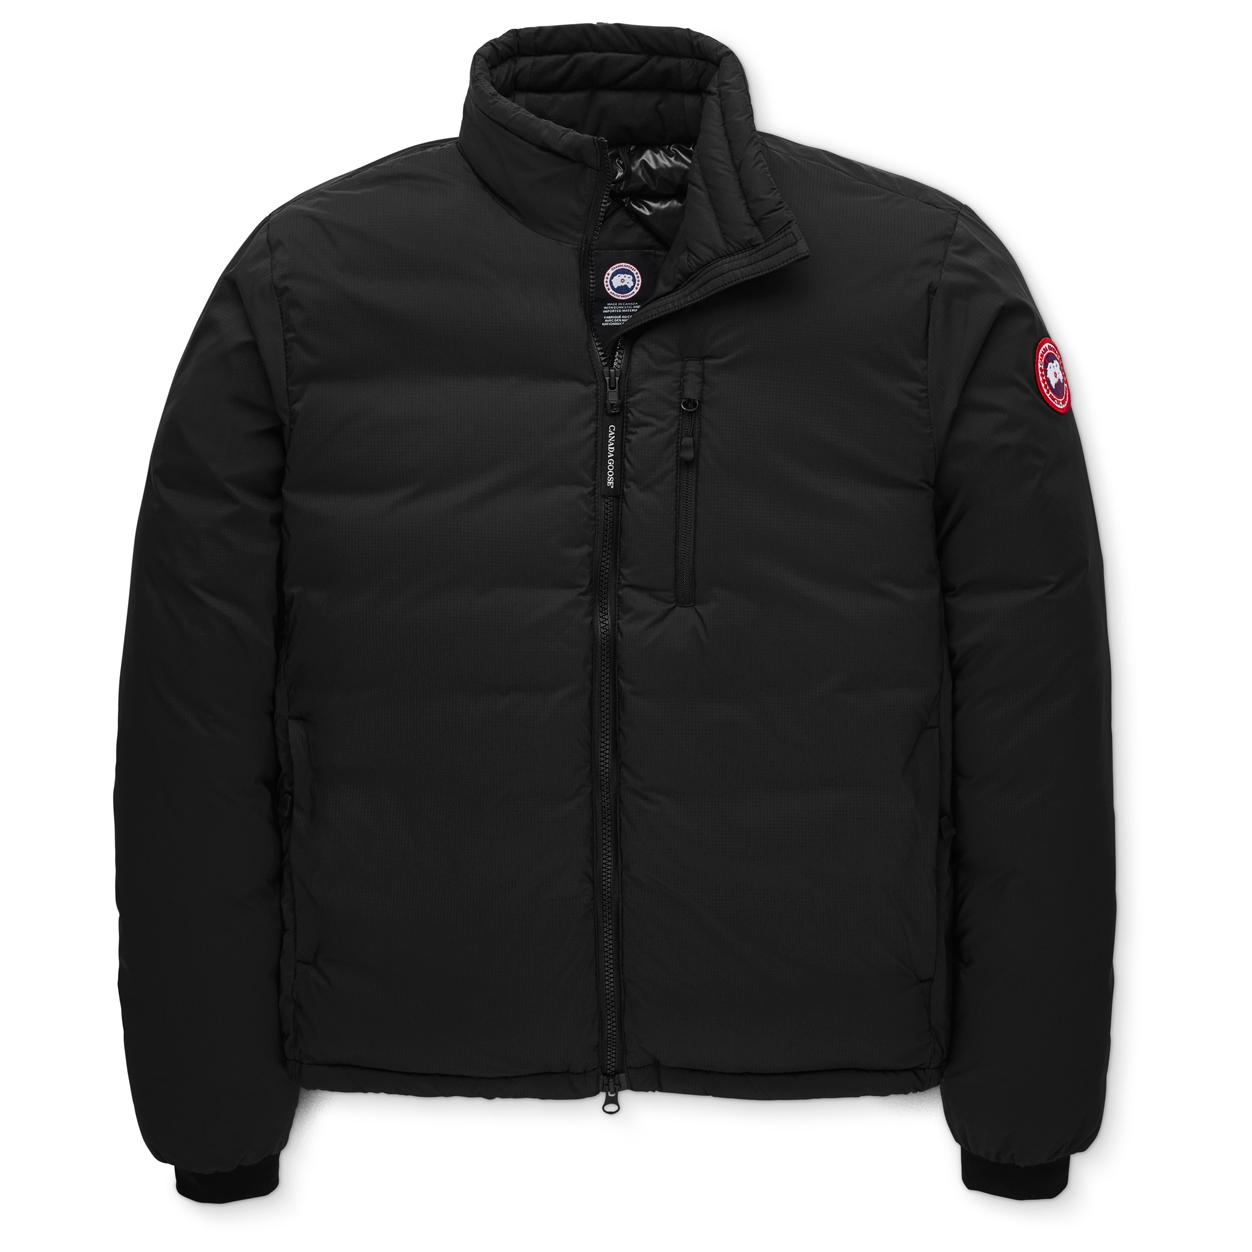 3d731dcfd Canada Goose - Lodge Jacket - Vinterjakke - Black | XS